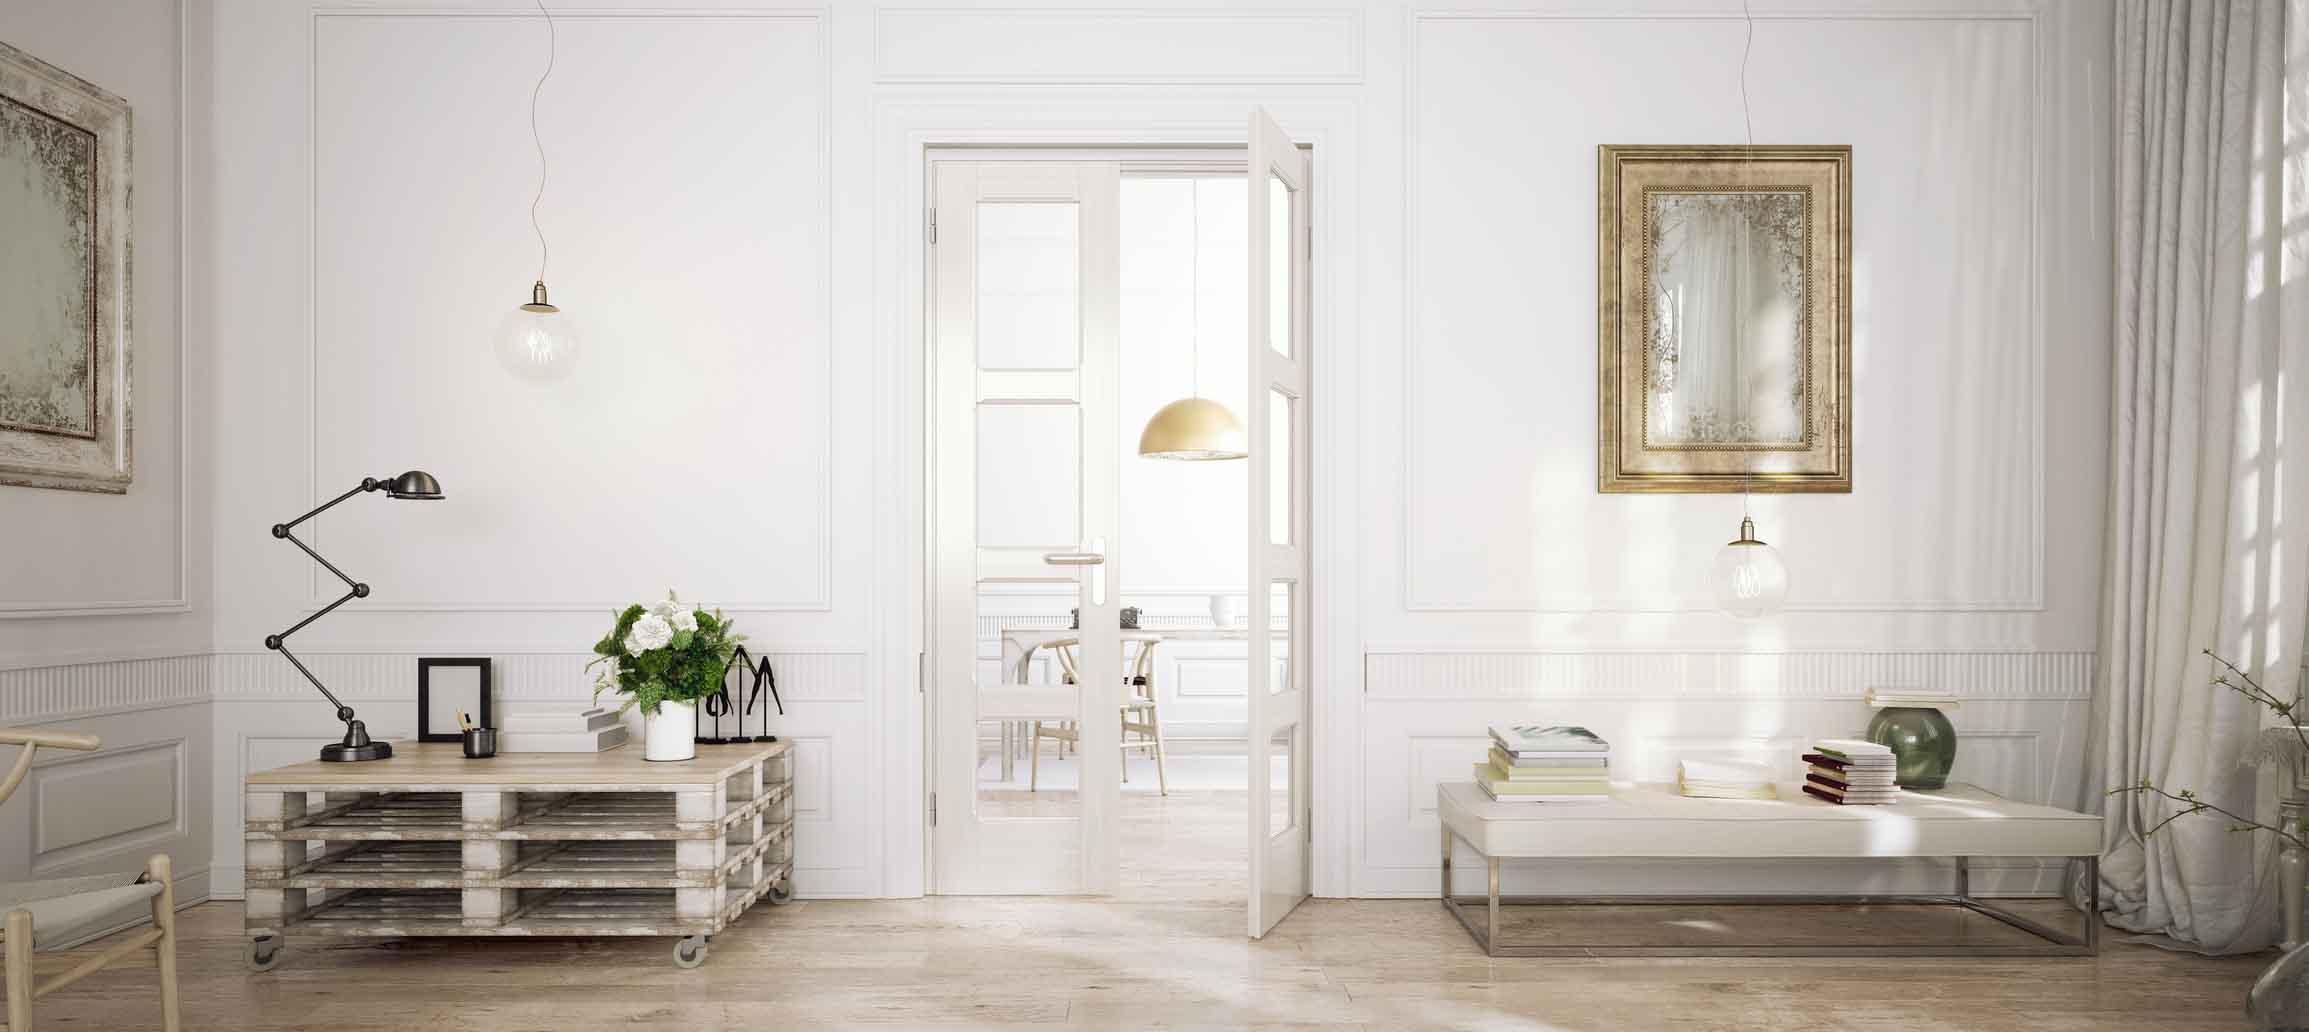 Interior Design- Rome